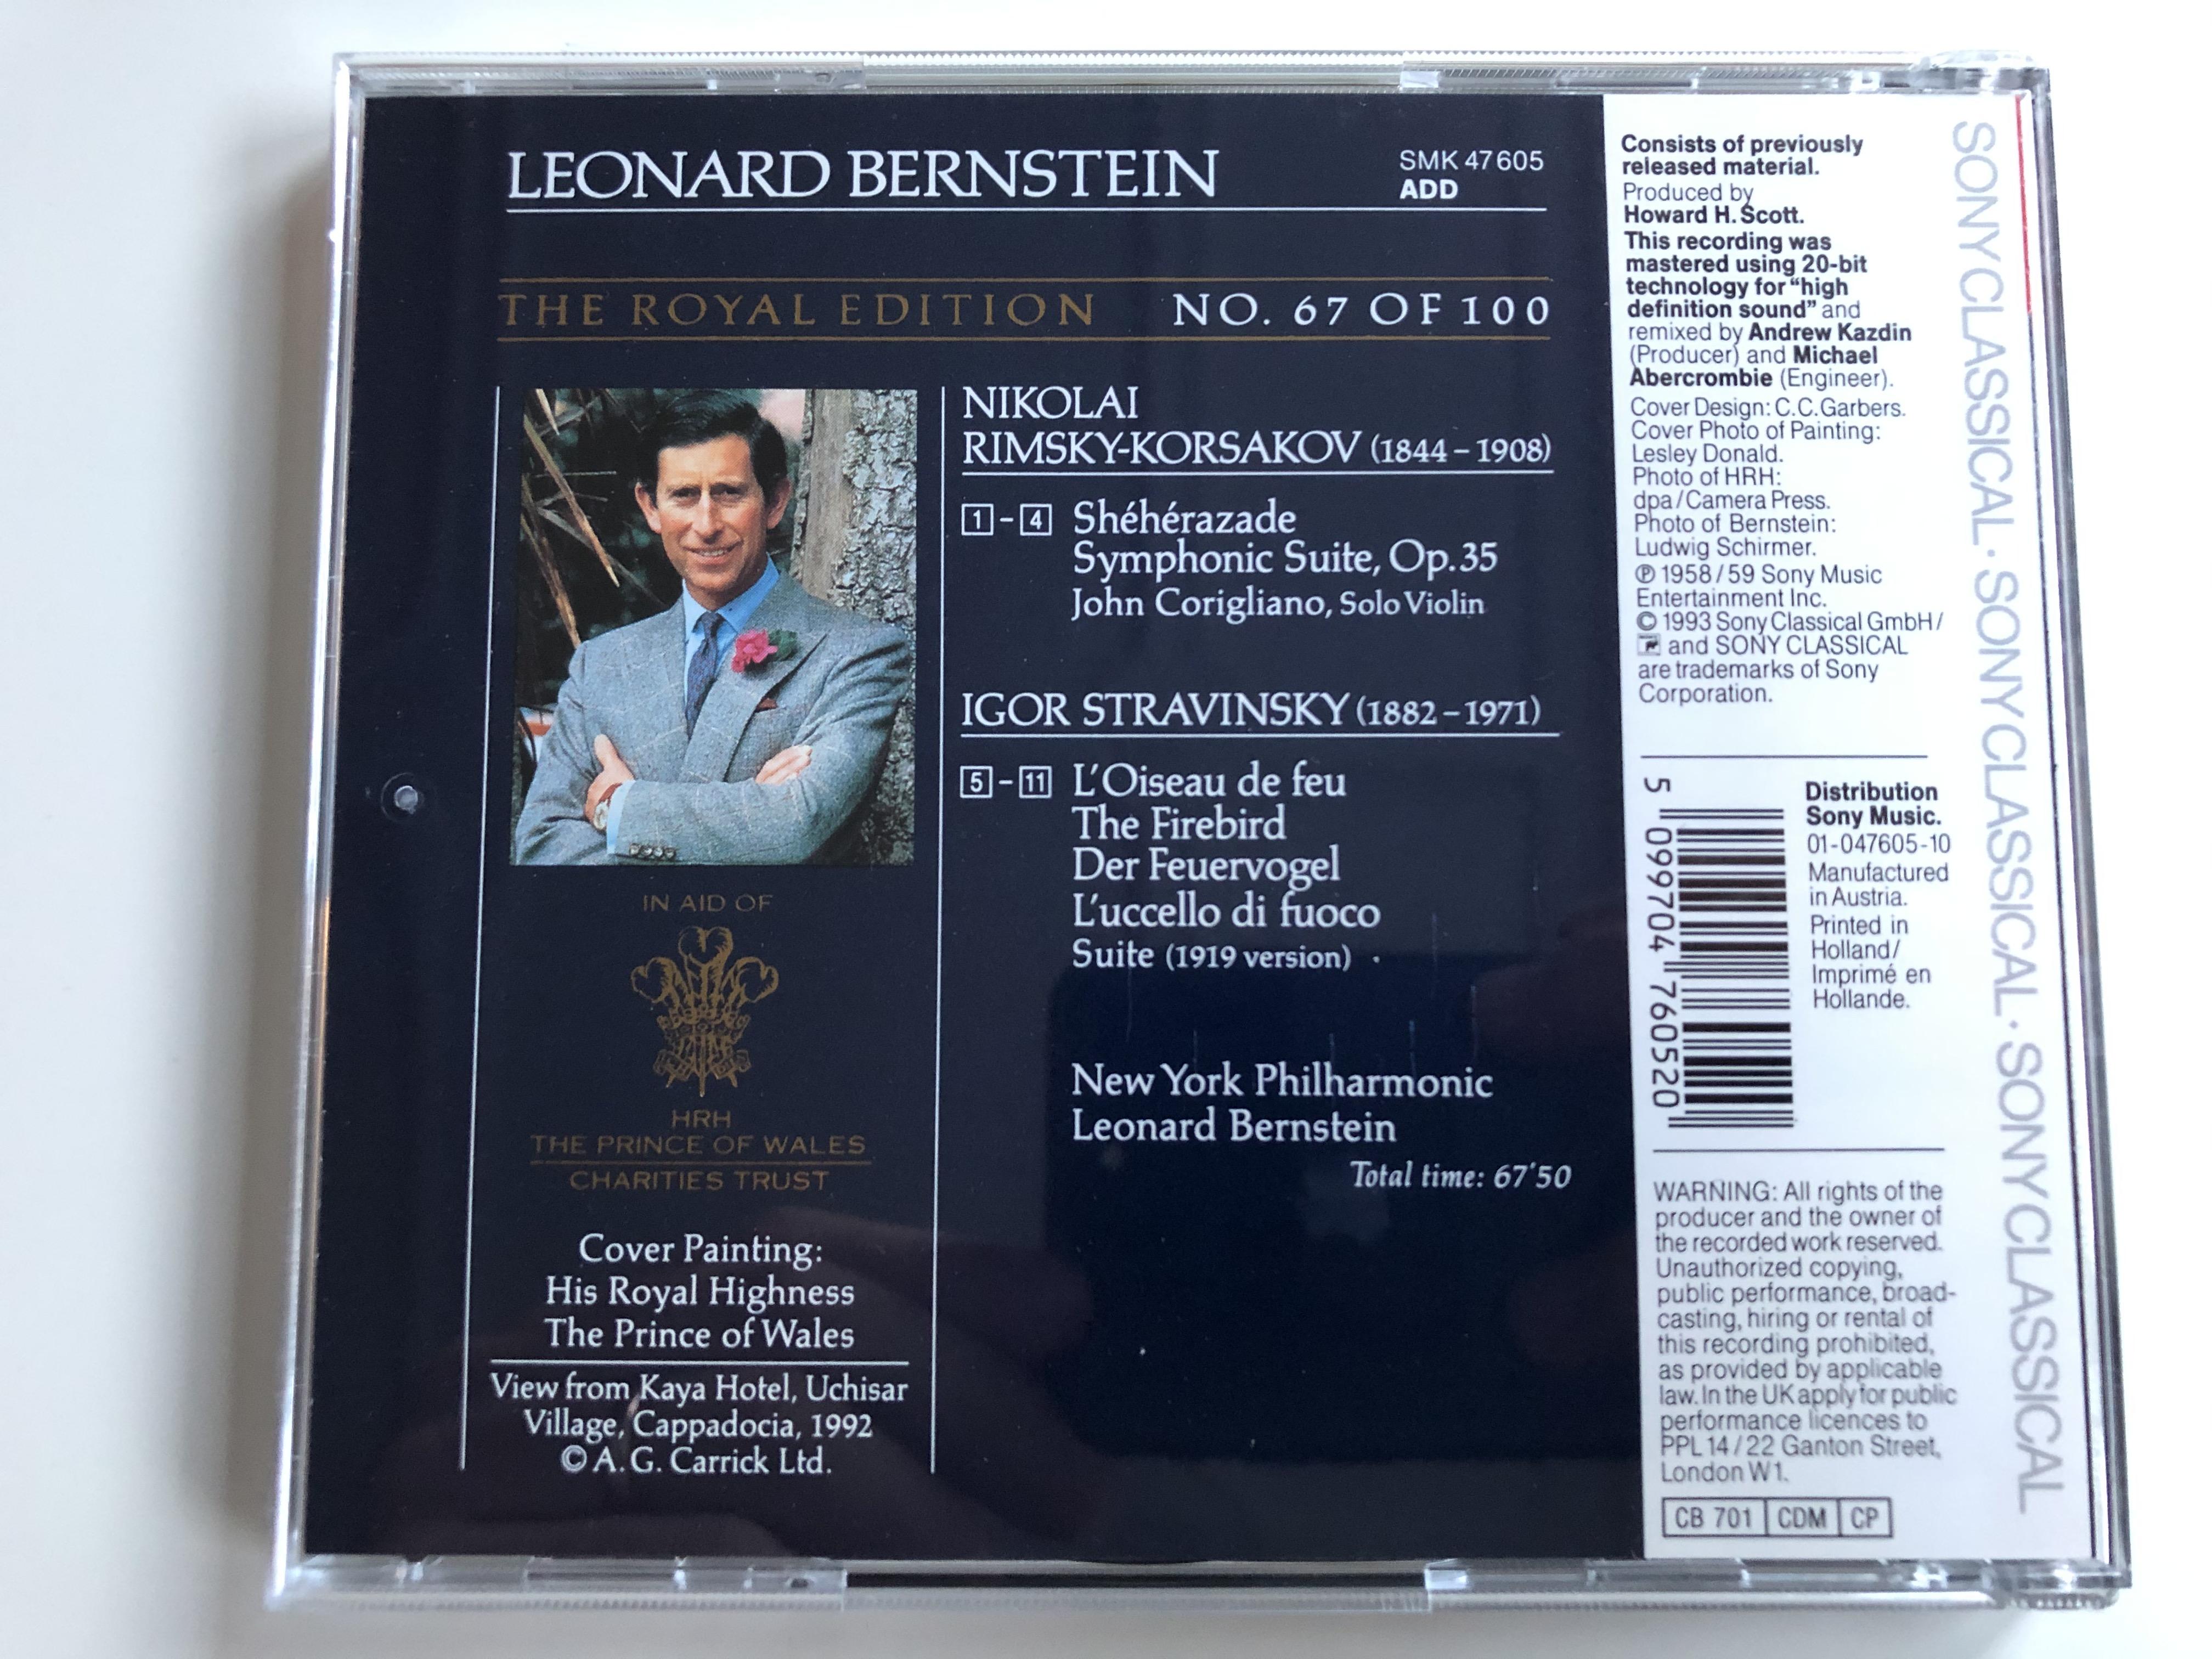 leonard-bernstein-rimsky-korsakov-sh-h-razade-stravinsky-the-firebird-suite-l-oiseau-de-feu-new-york-philharmonic-the-royal-edition-painting-by-h.r.h.-the-prince-of-wales-sony-classical-7-.jpg